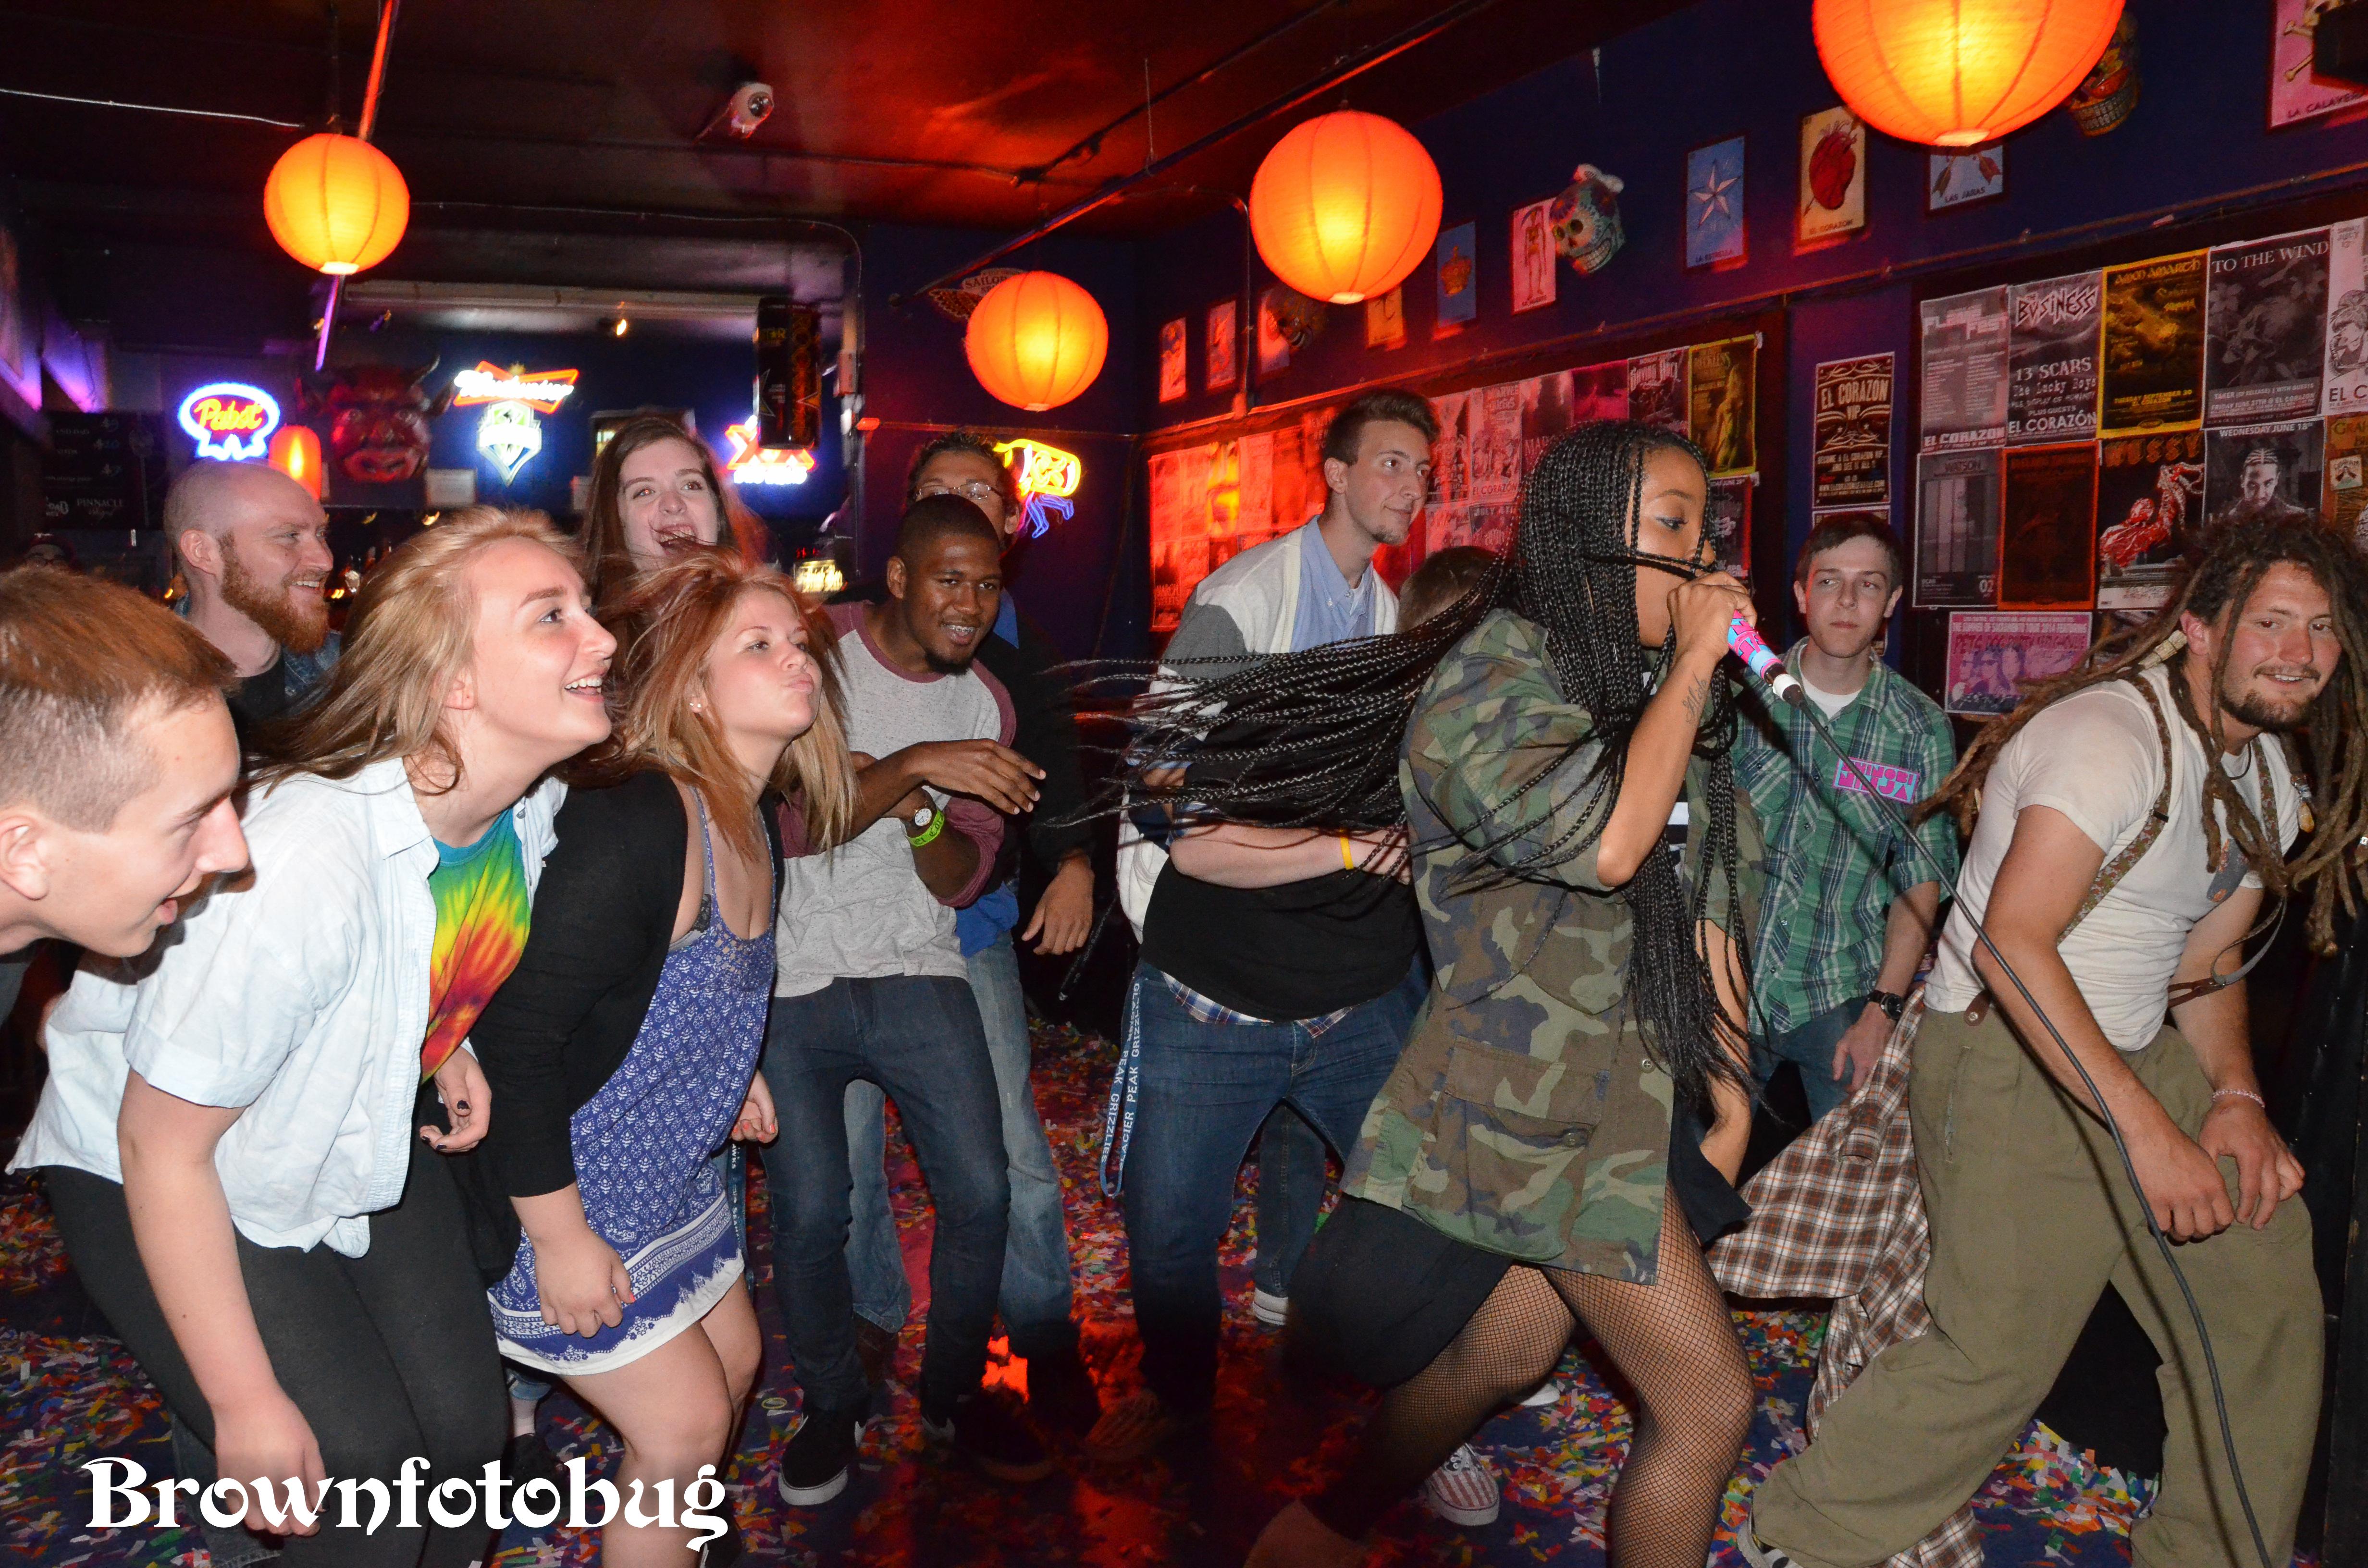 Shinobi Ninja Live at El Corazon (Photo by Arlene Brown)